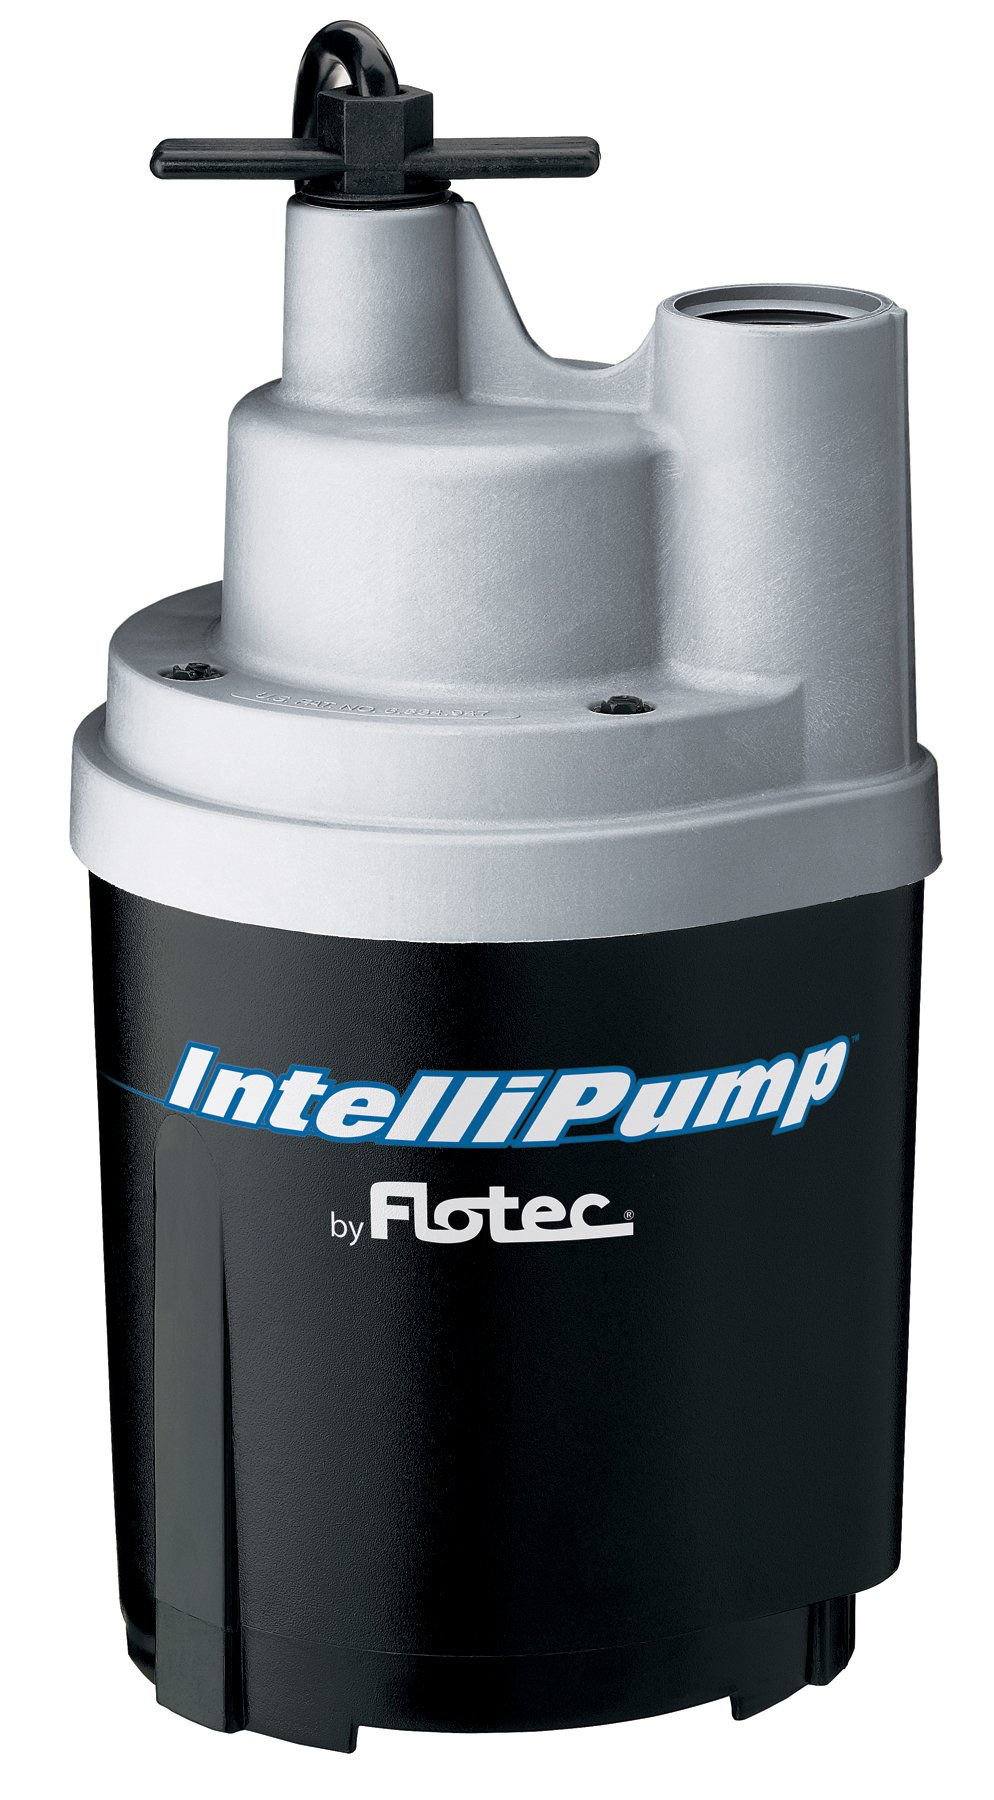 Pentair FPOS1775A Flotec IntelliPump Water Removal Utility Pump, 1790 Gph, 1/4 Hp, 115 Vac, 60 Hz, 15 Ft by Pentair